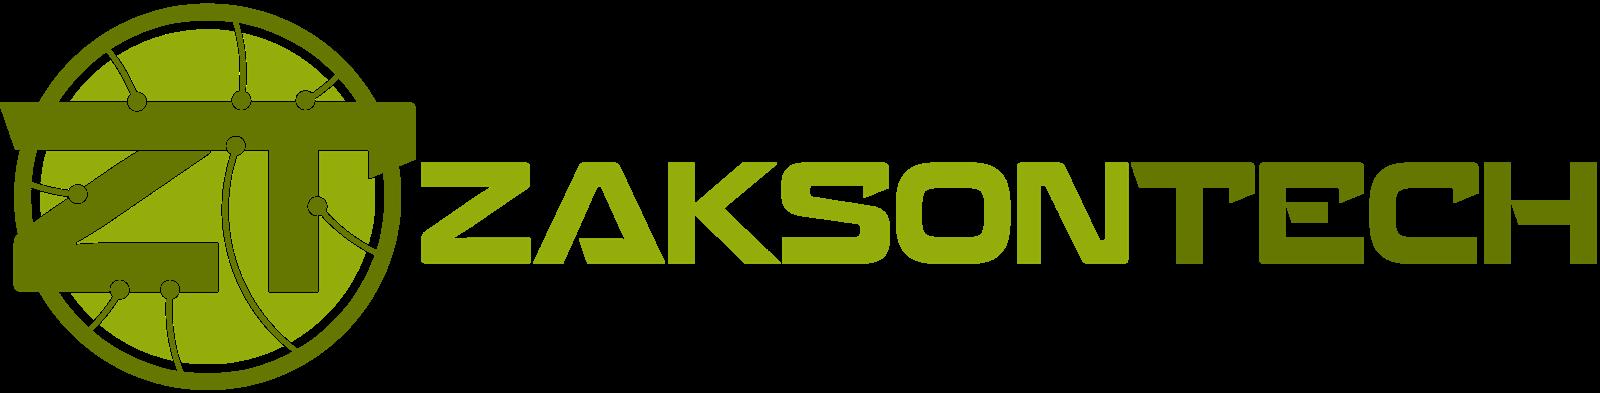 Zakson Tech